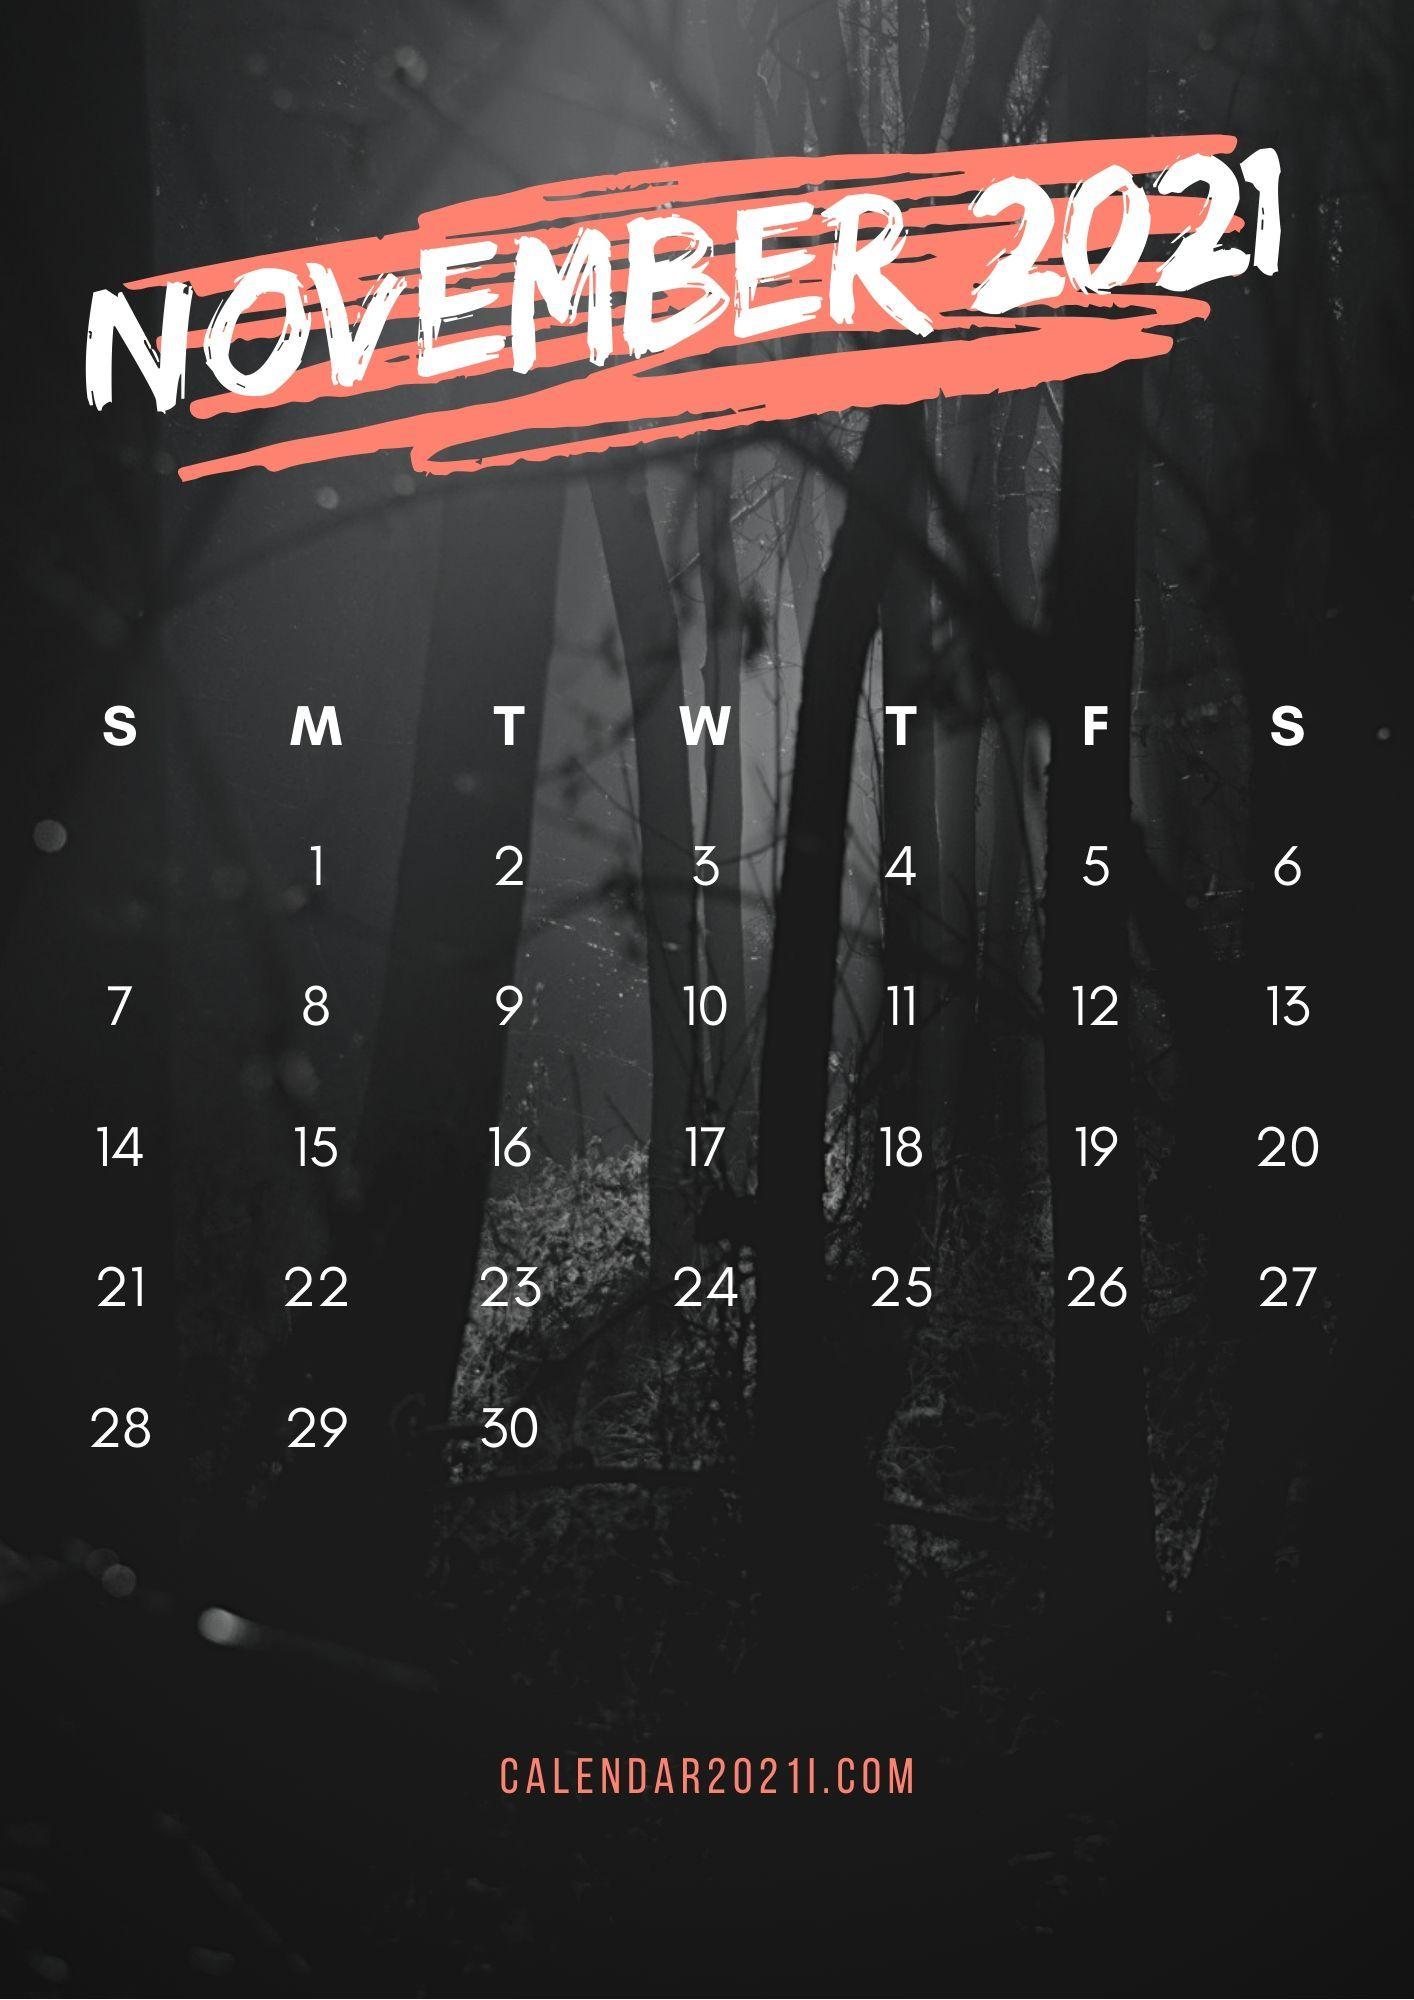 November 2021 Calendar iPhone HD Wallpaper printable 1414x2000